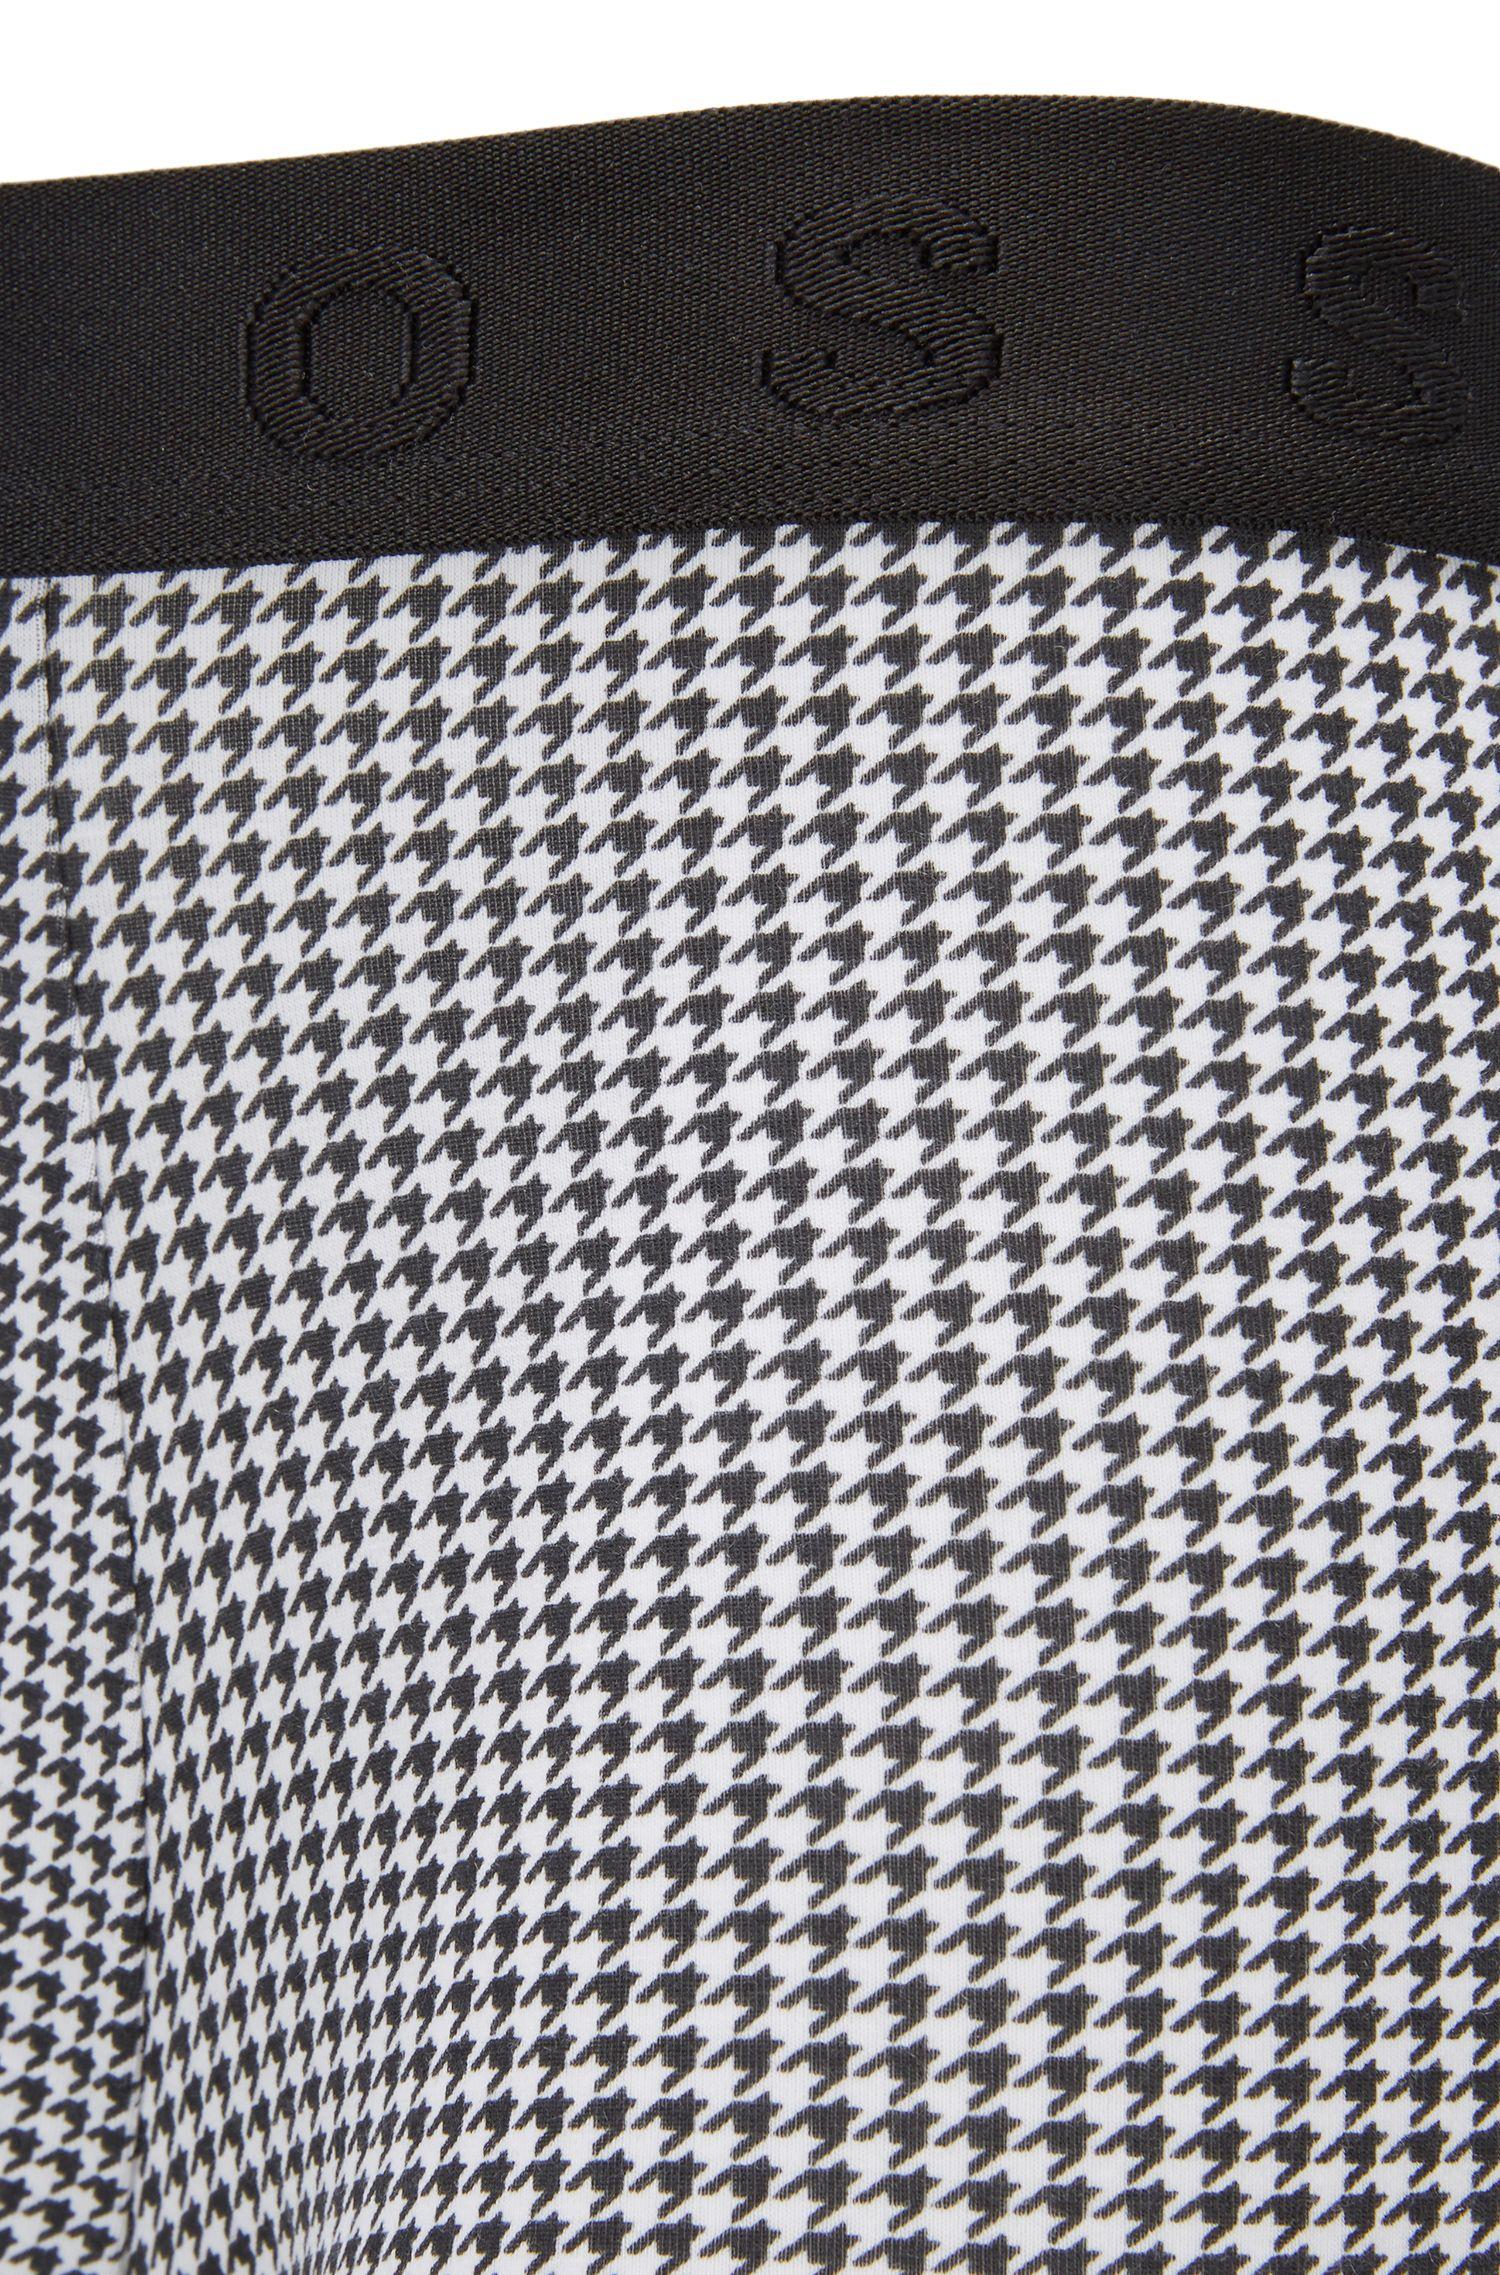 Stretch Cotton Modal Trunk | Trunk Microprint, Black